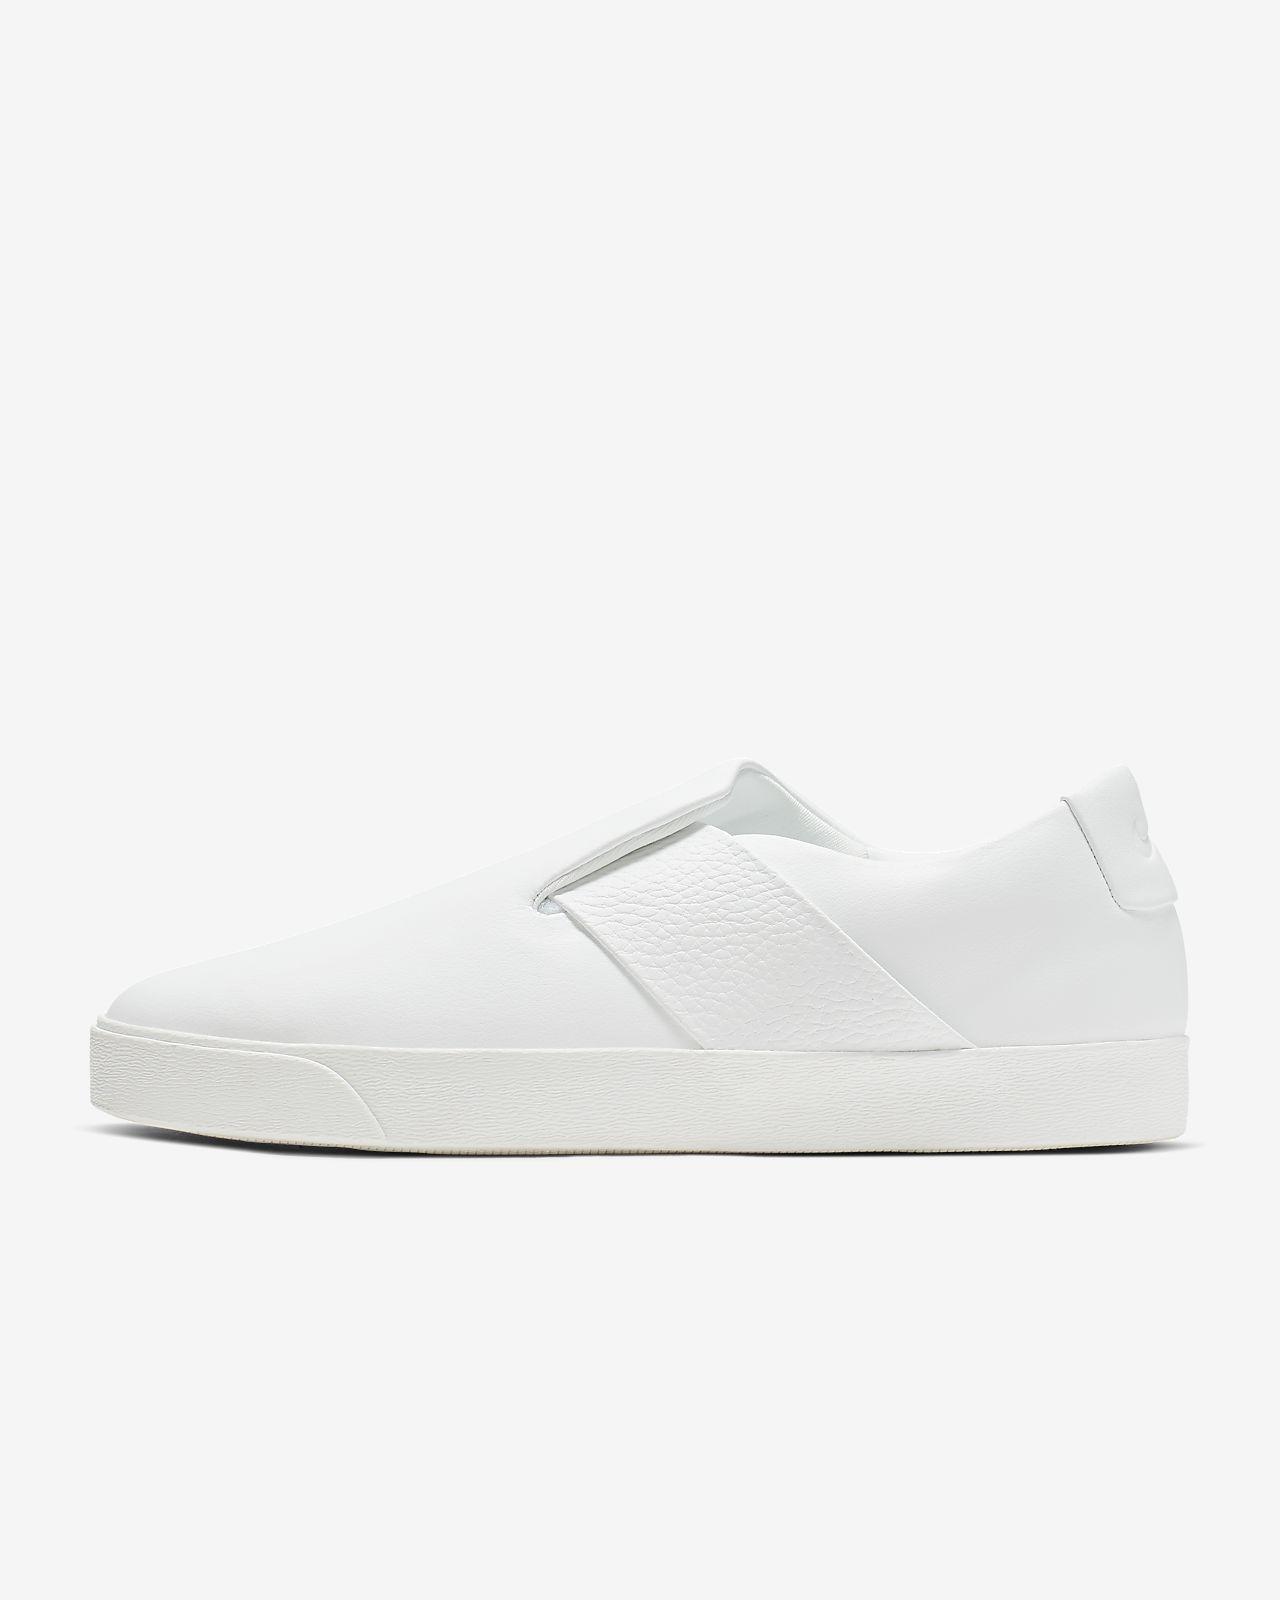 Nike Blazer City Ease Women's Shoe